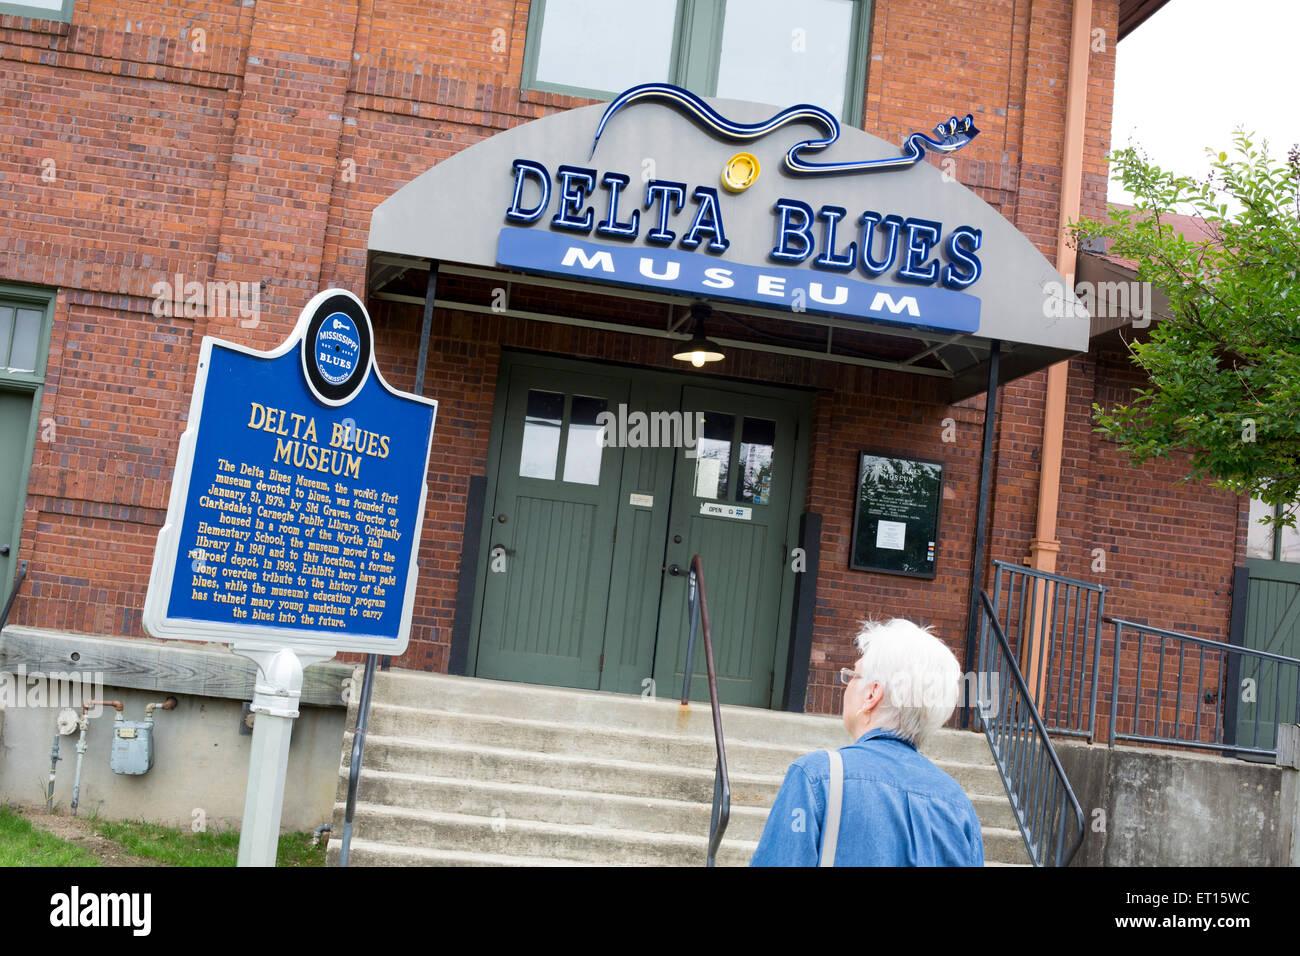 Clarksdale, Mississippi - El Delta Blues Museum. Imagen De Stock